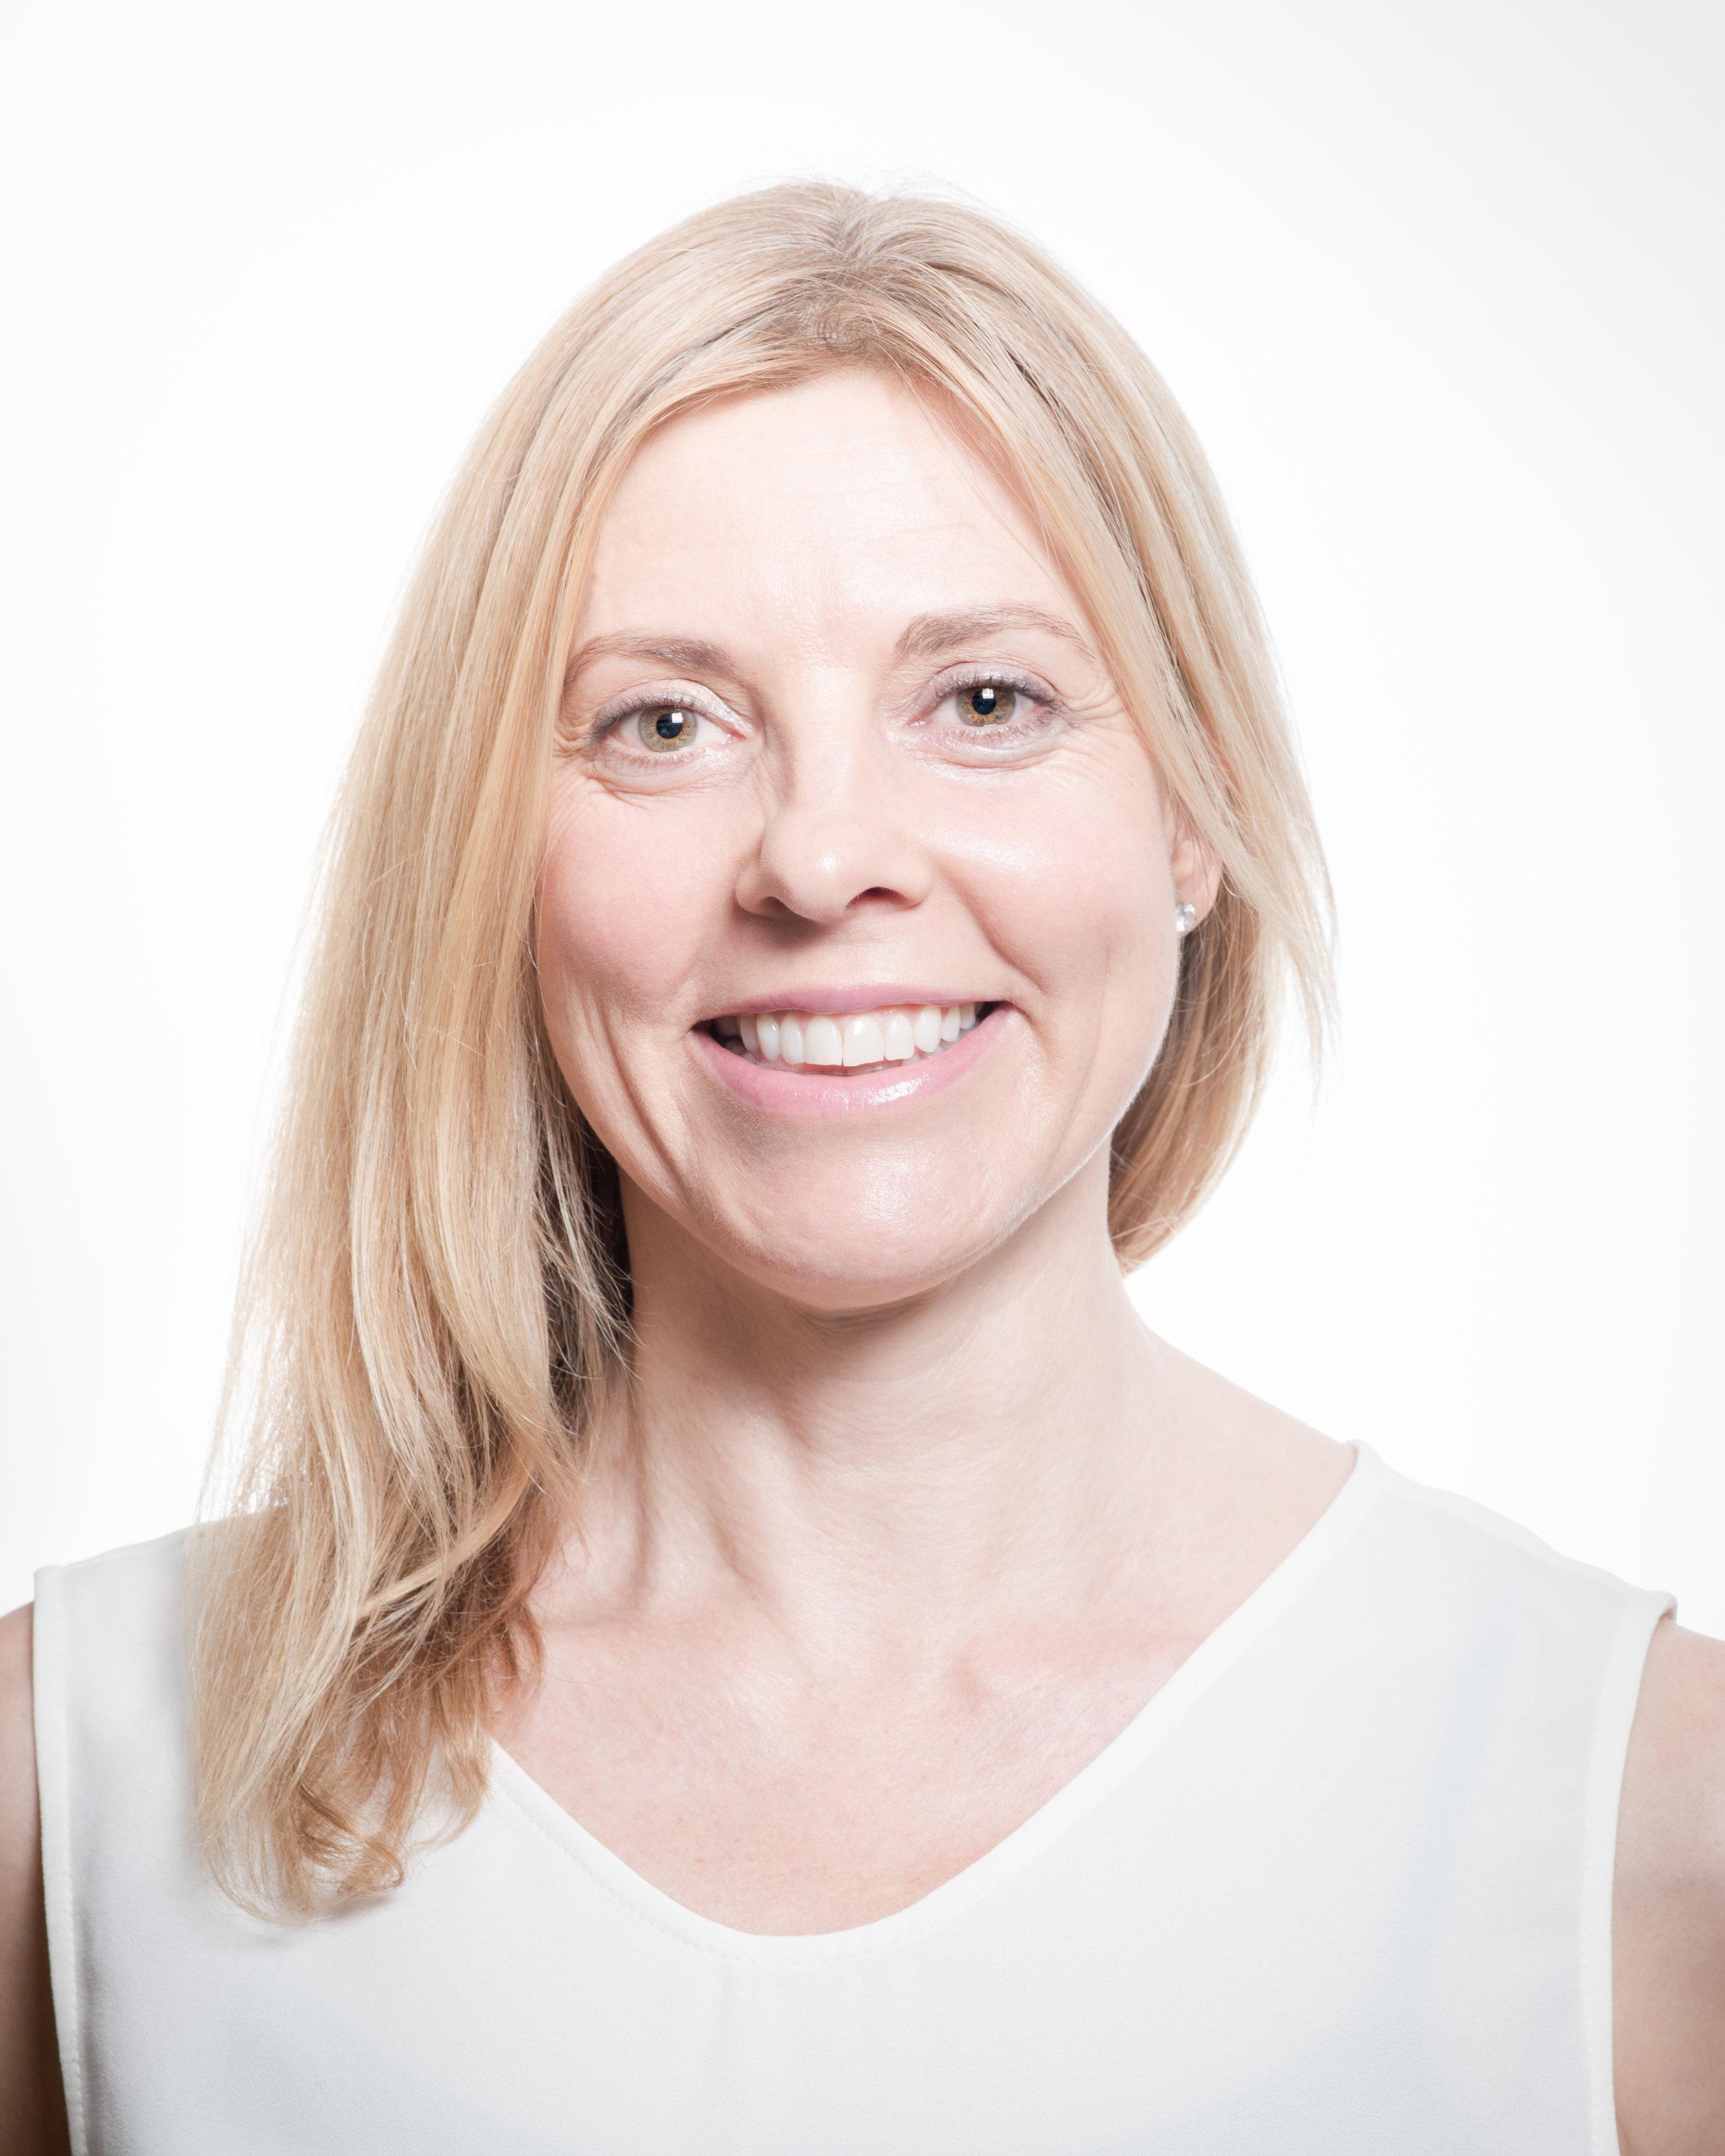 Nicola Speer - Radiology Recruitment Specialistnicola@prescript.com.au0405 429 799